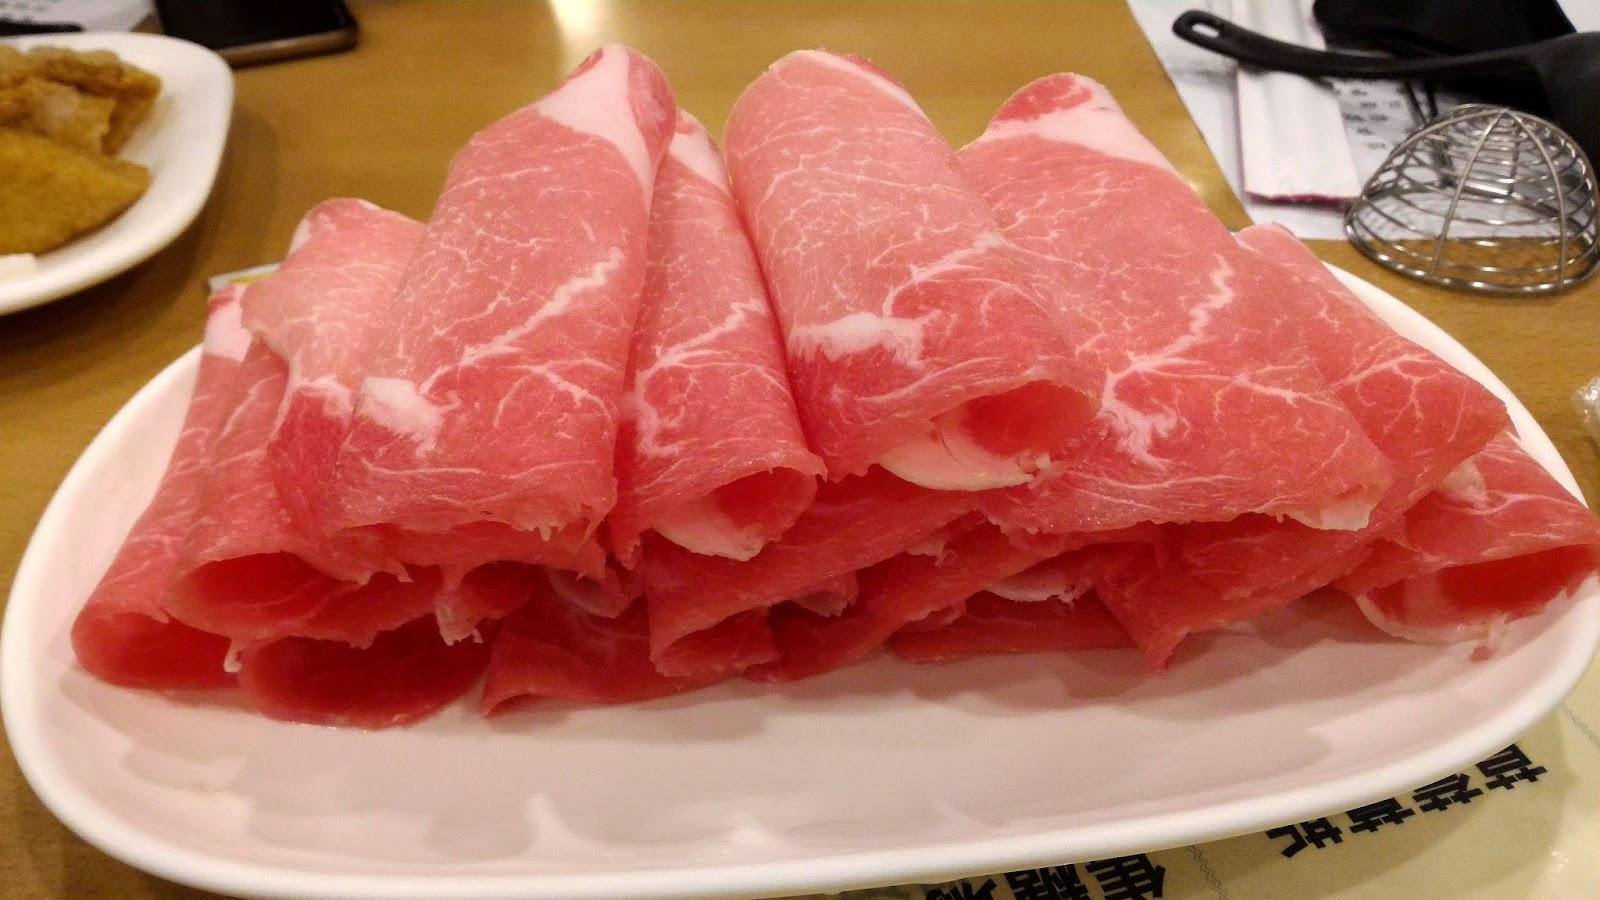 P 20160725 182048 - [食記] 廣香吃到飽日式涮涮鍋,超多種飲料、冰品及甜點!